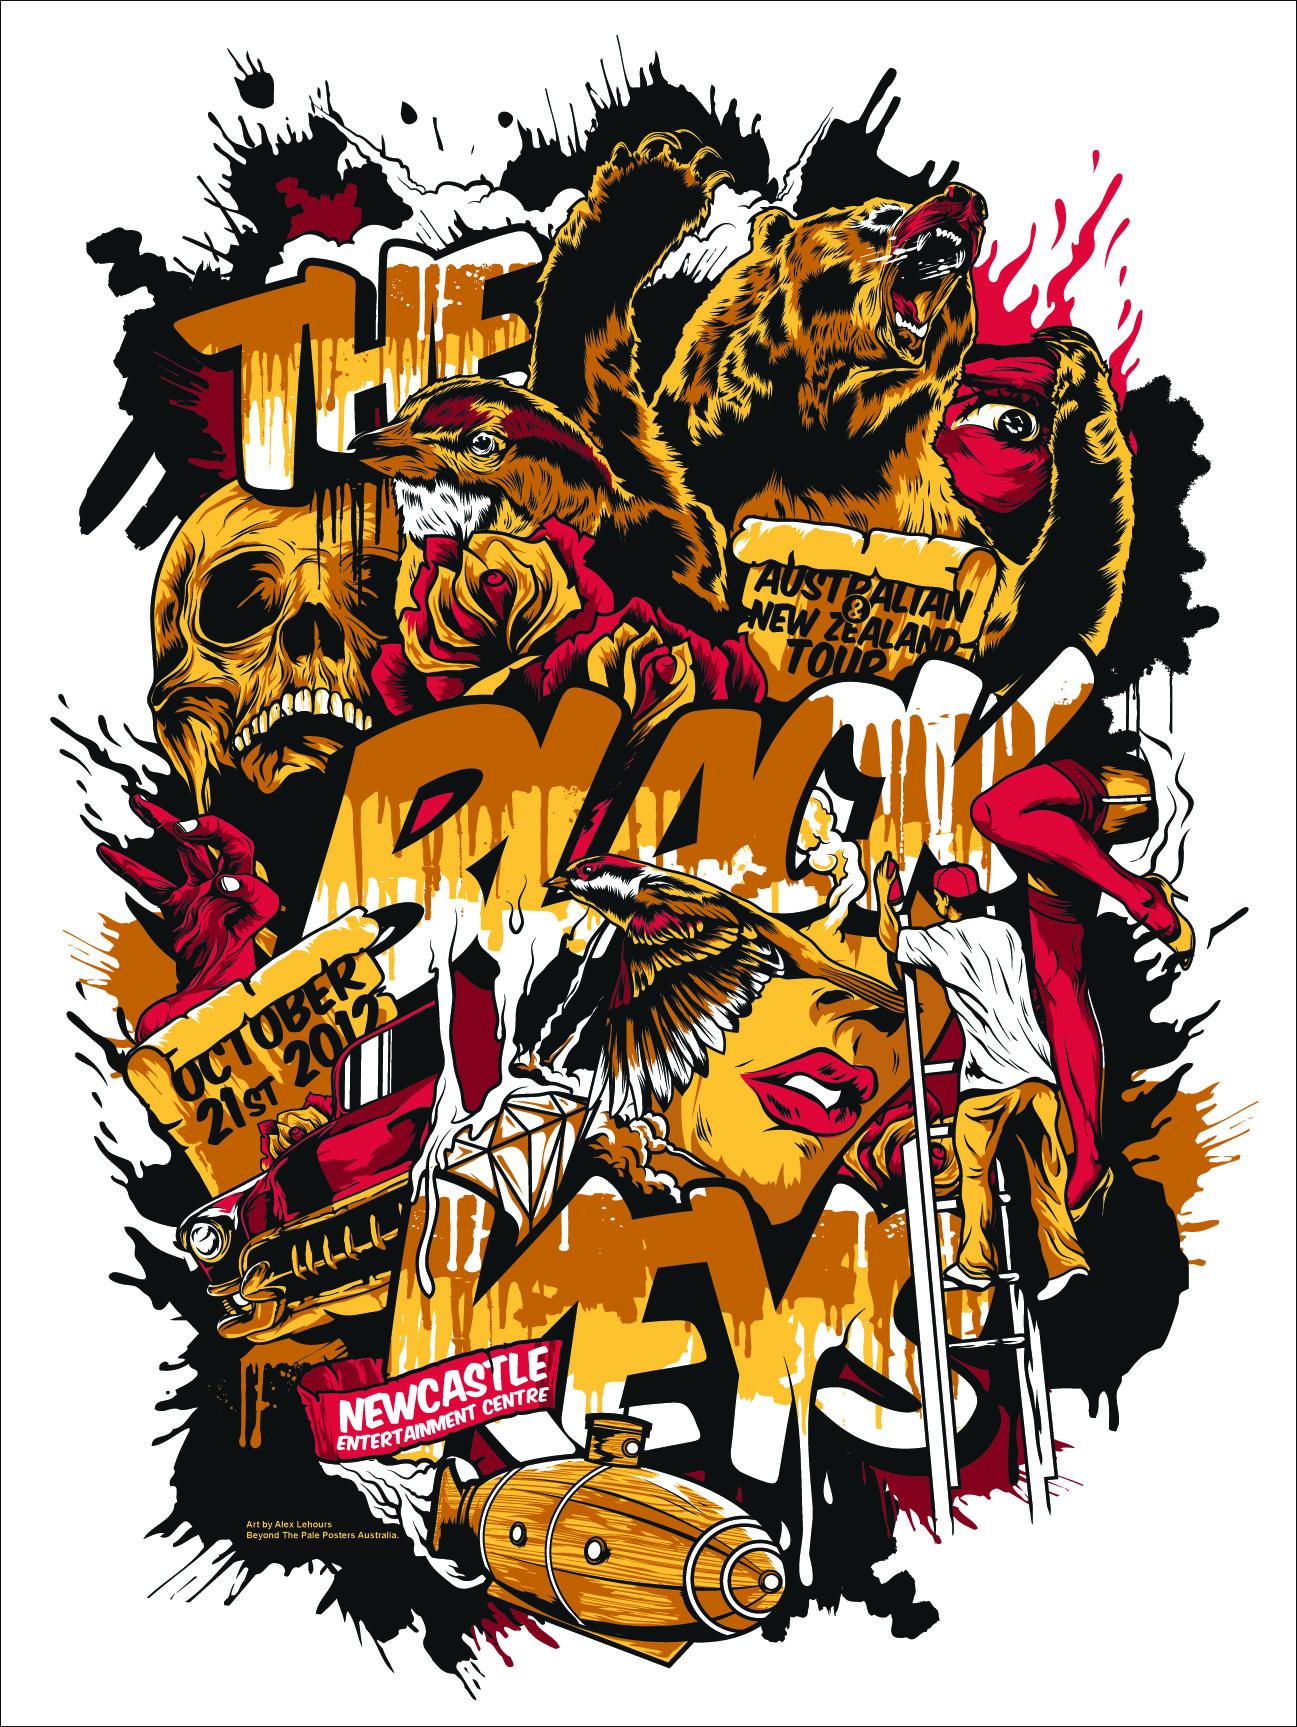 LeHours The Black Keys Newcastle Aust 2012